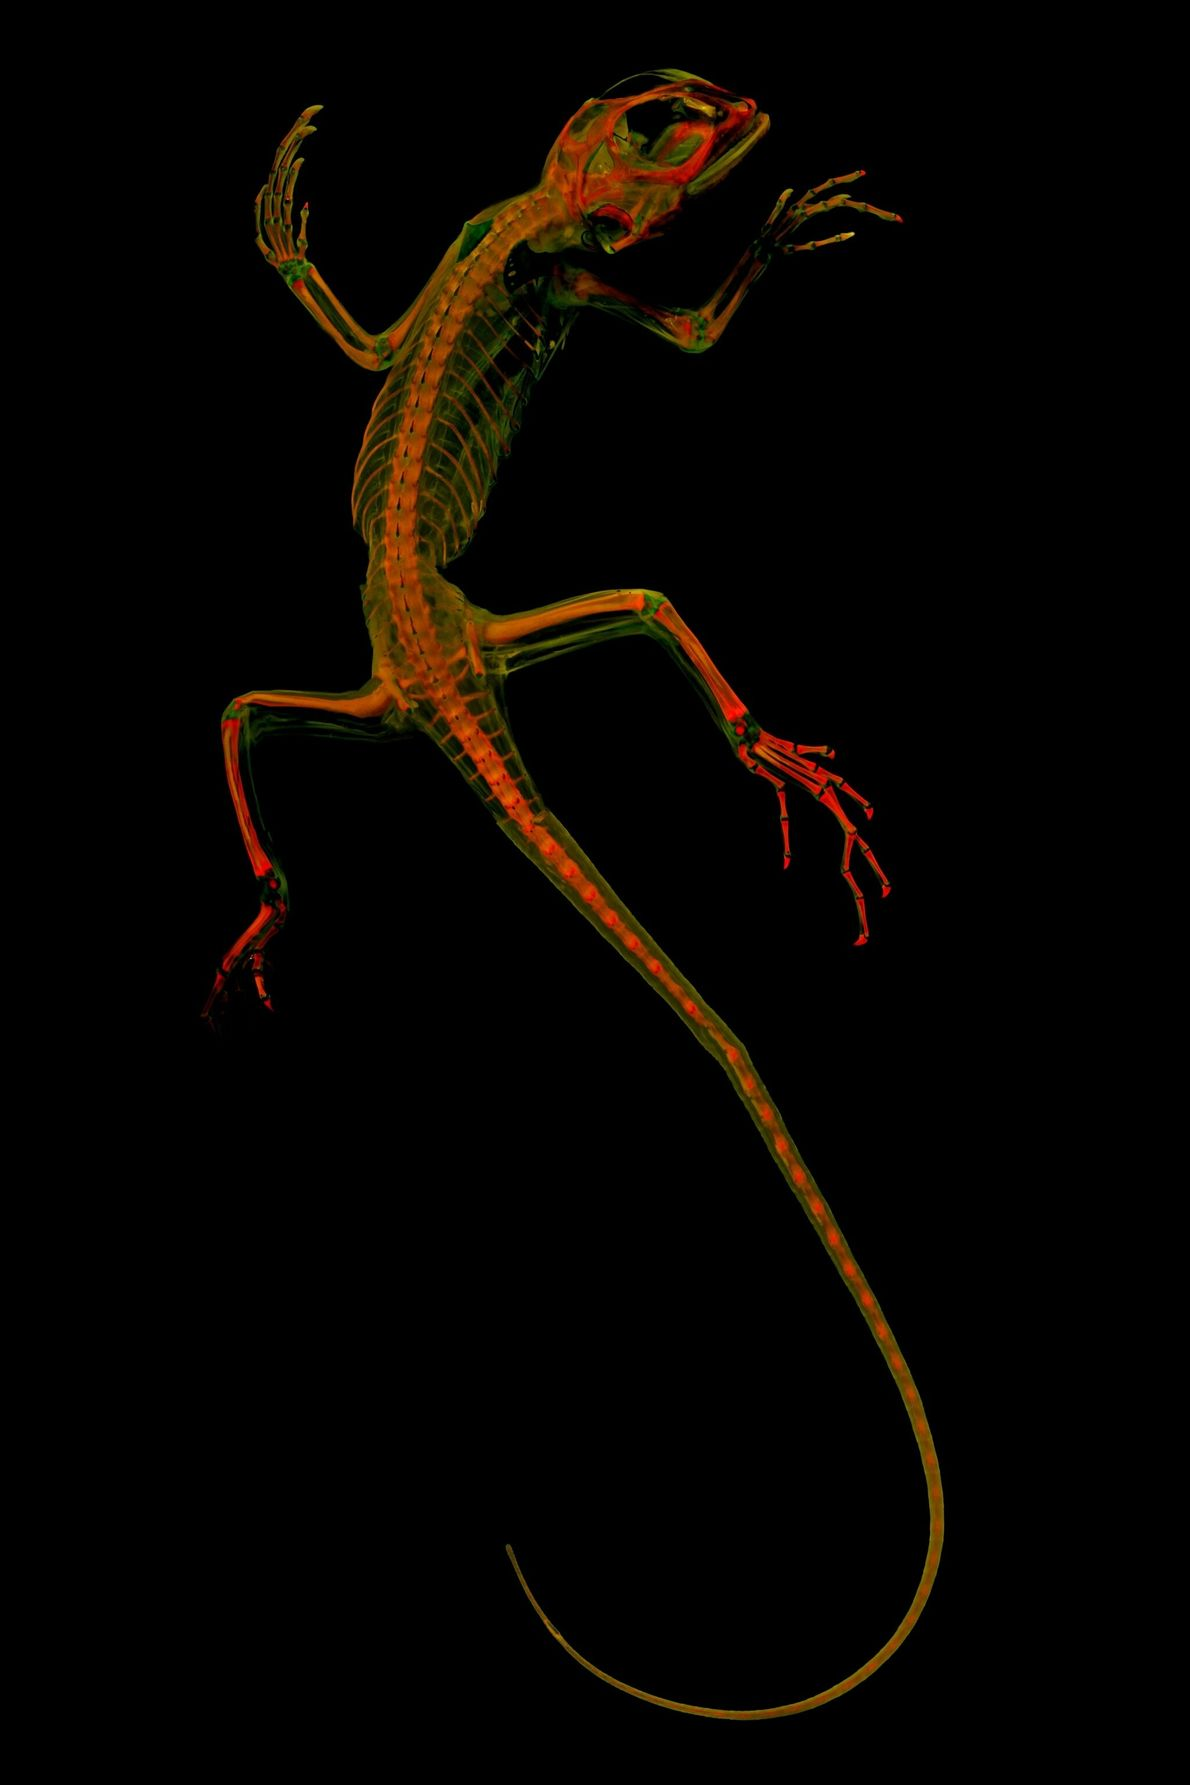 vertebrate-skeletons-4